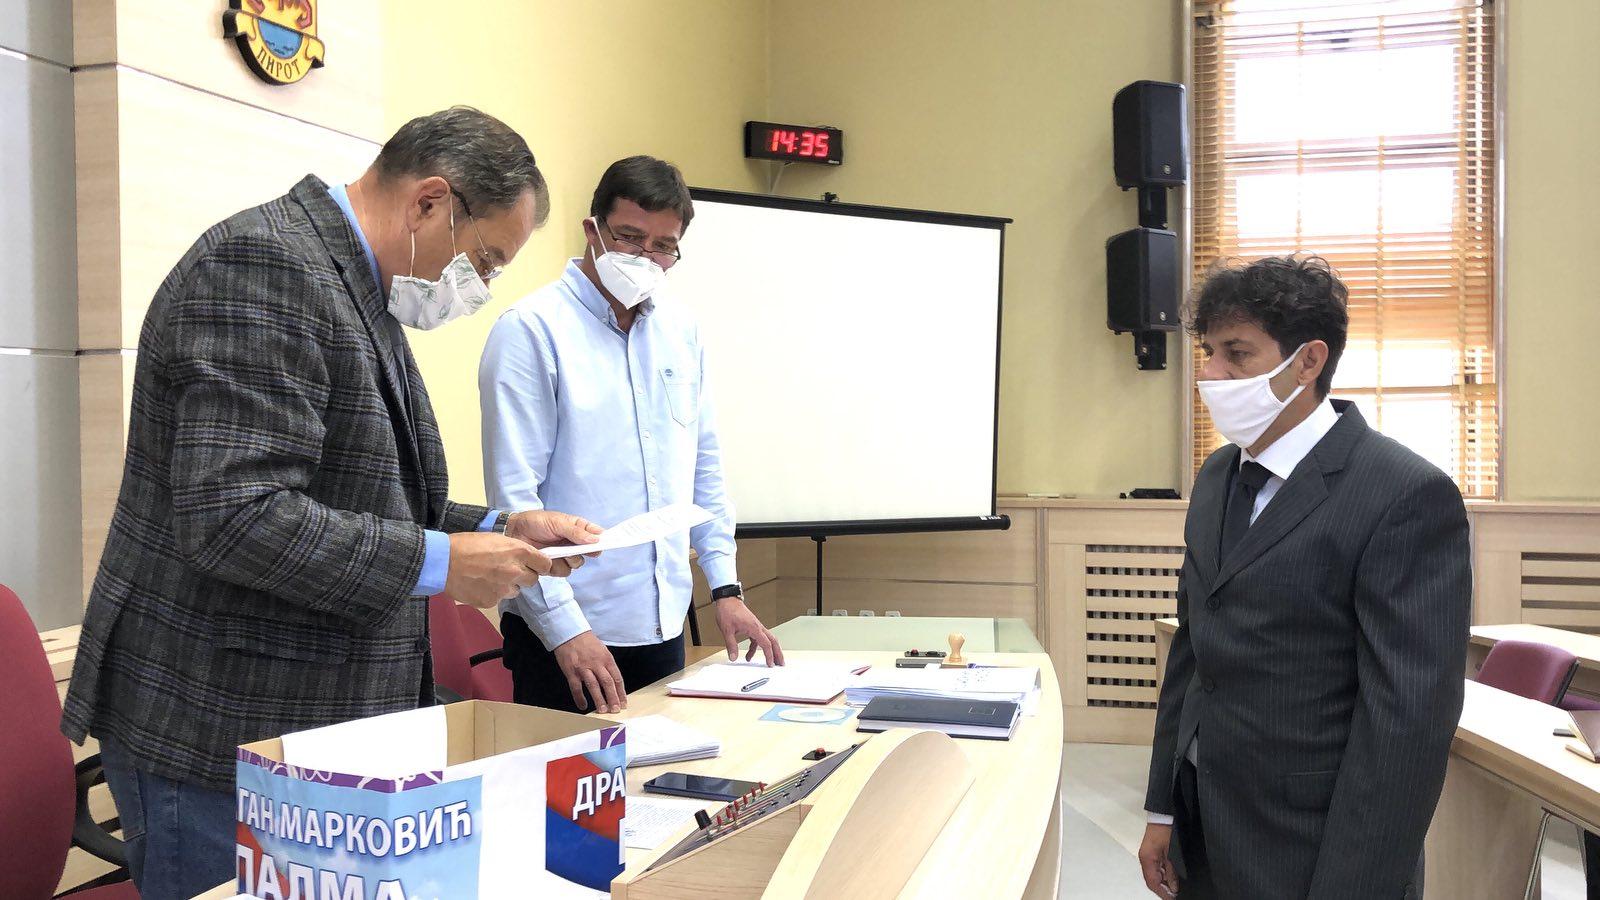 JS predala listu kandidata za odbornike